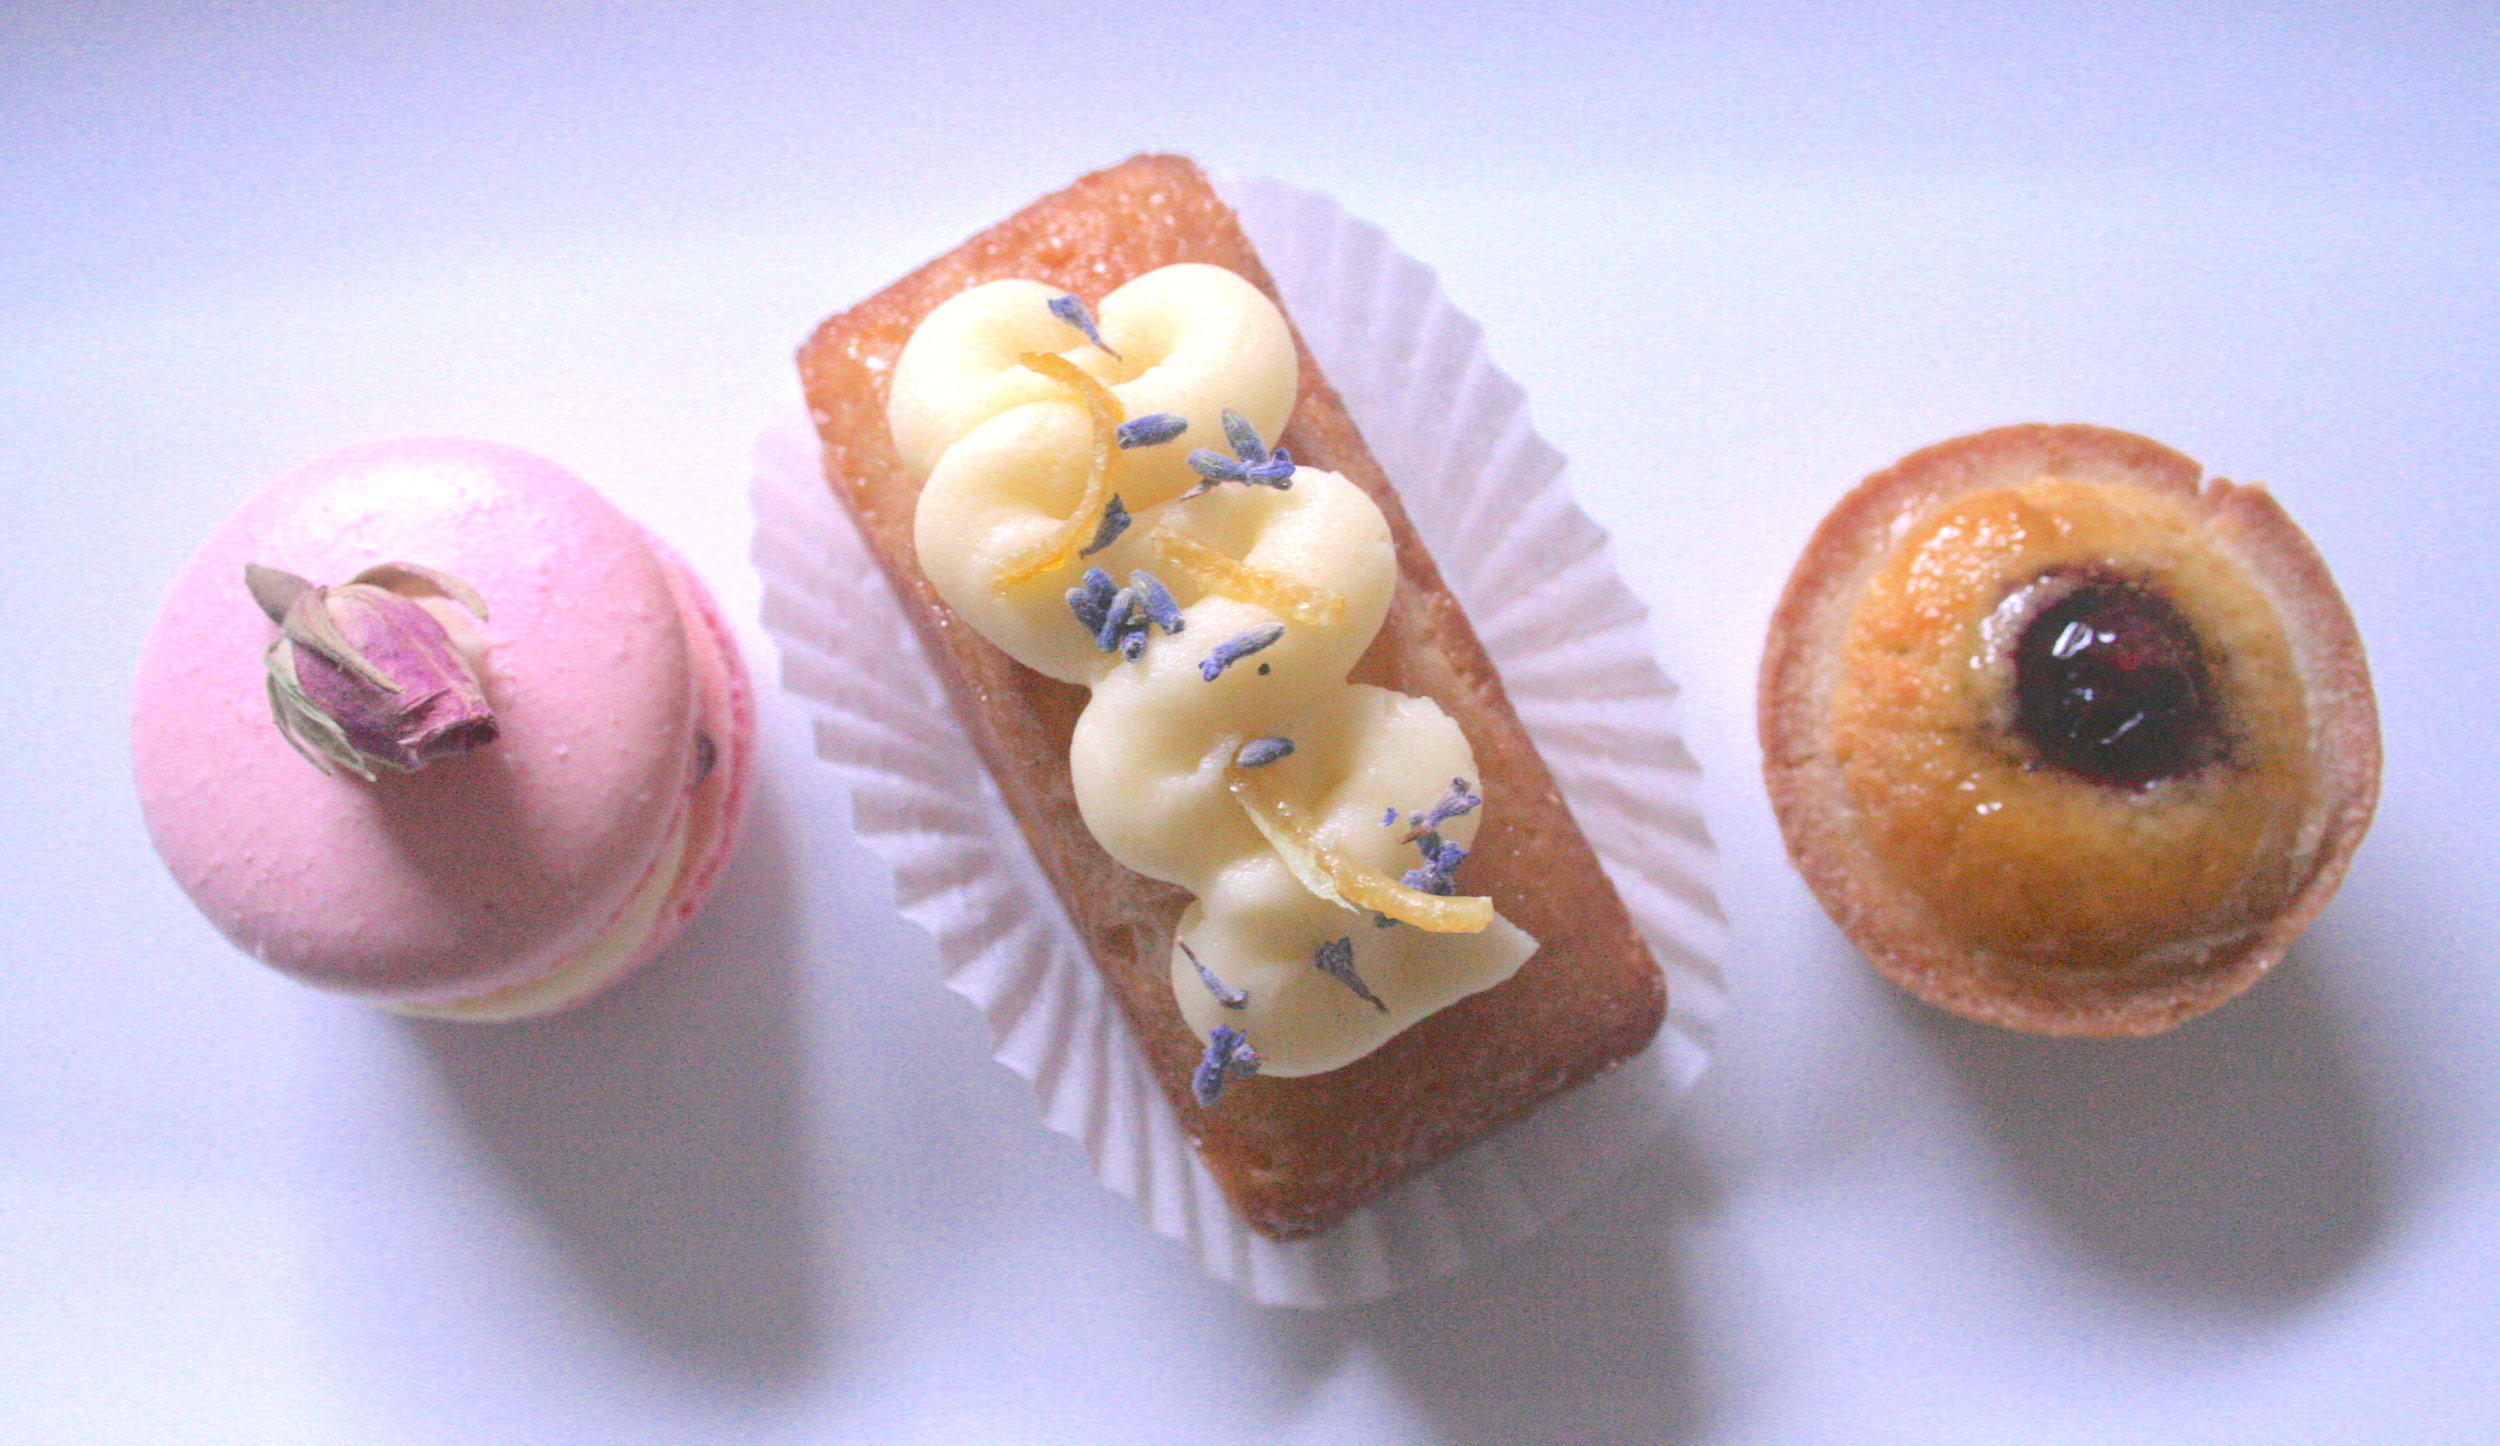 Afternoon Tea: Rose & Raspberry Macaron, Lemon & Lavender cake, Almond & Blueberry Tartlet